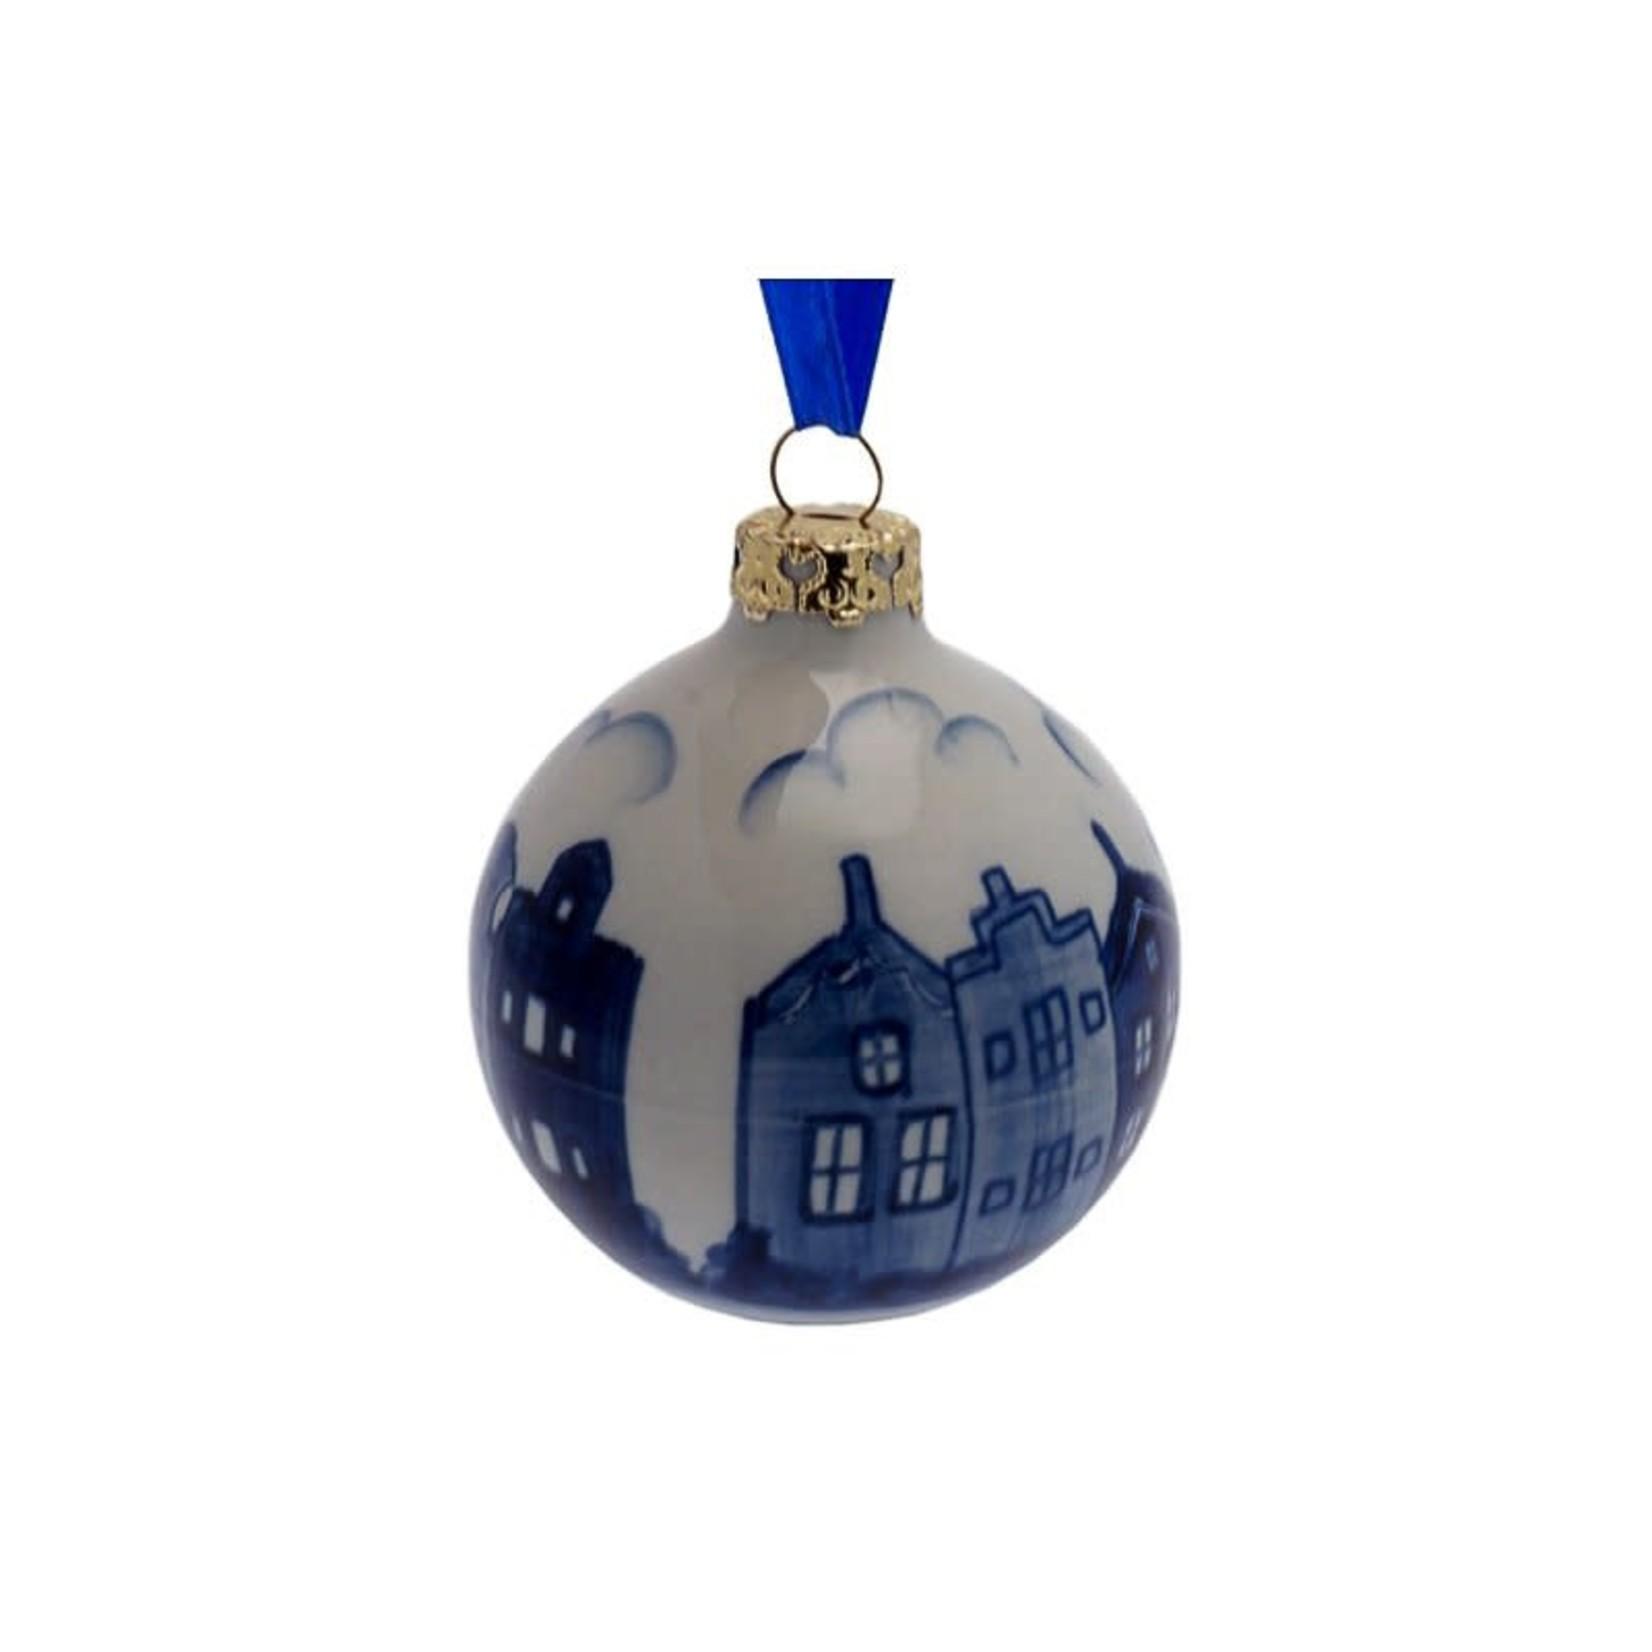 Heinen Delfts Blauw Kerstbal Grachtenpanden